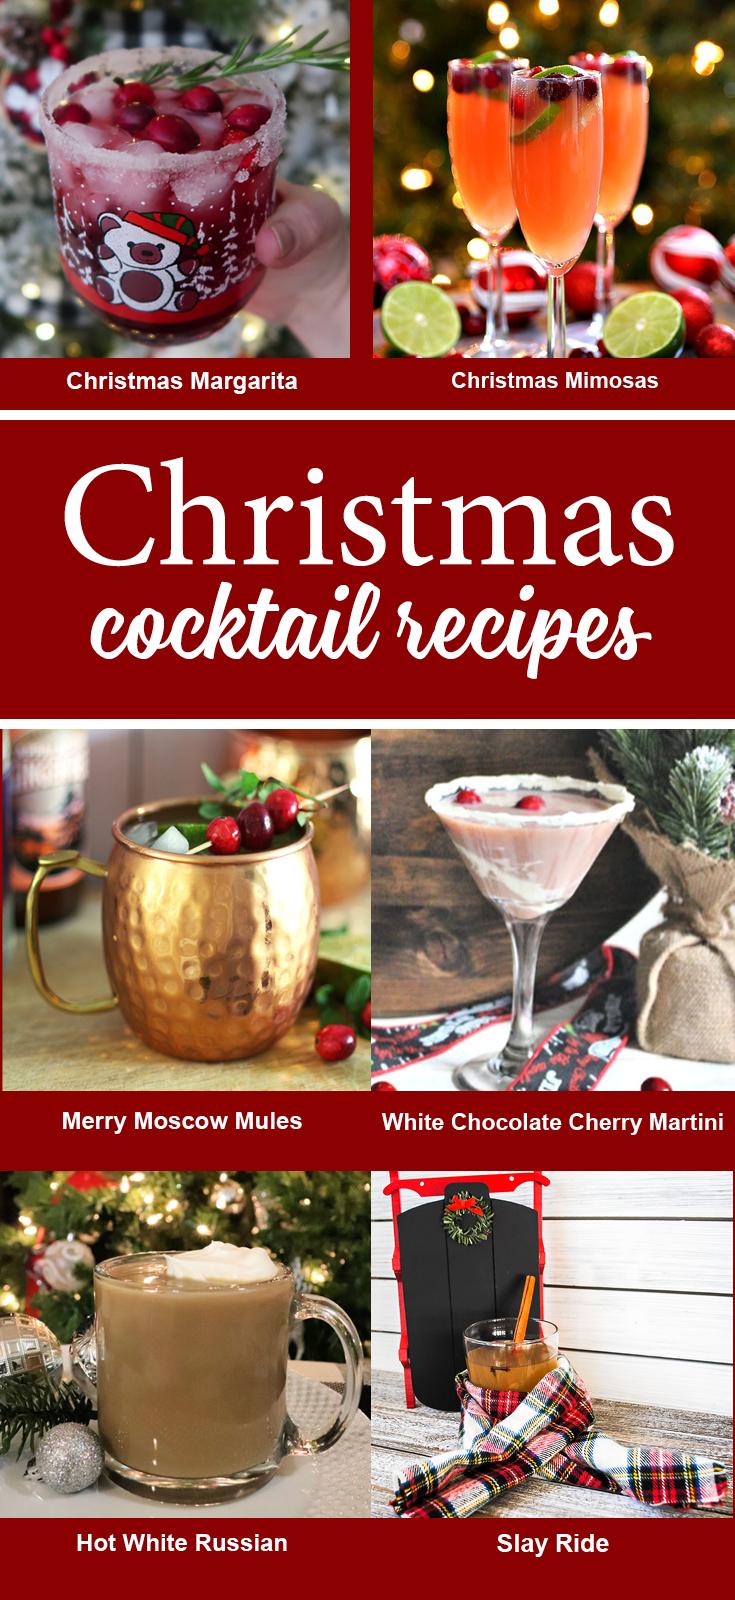 6 Christmas Cocktails.jpg